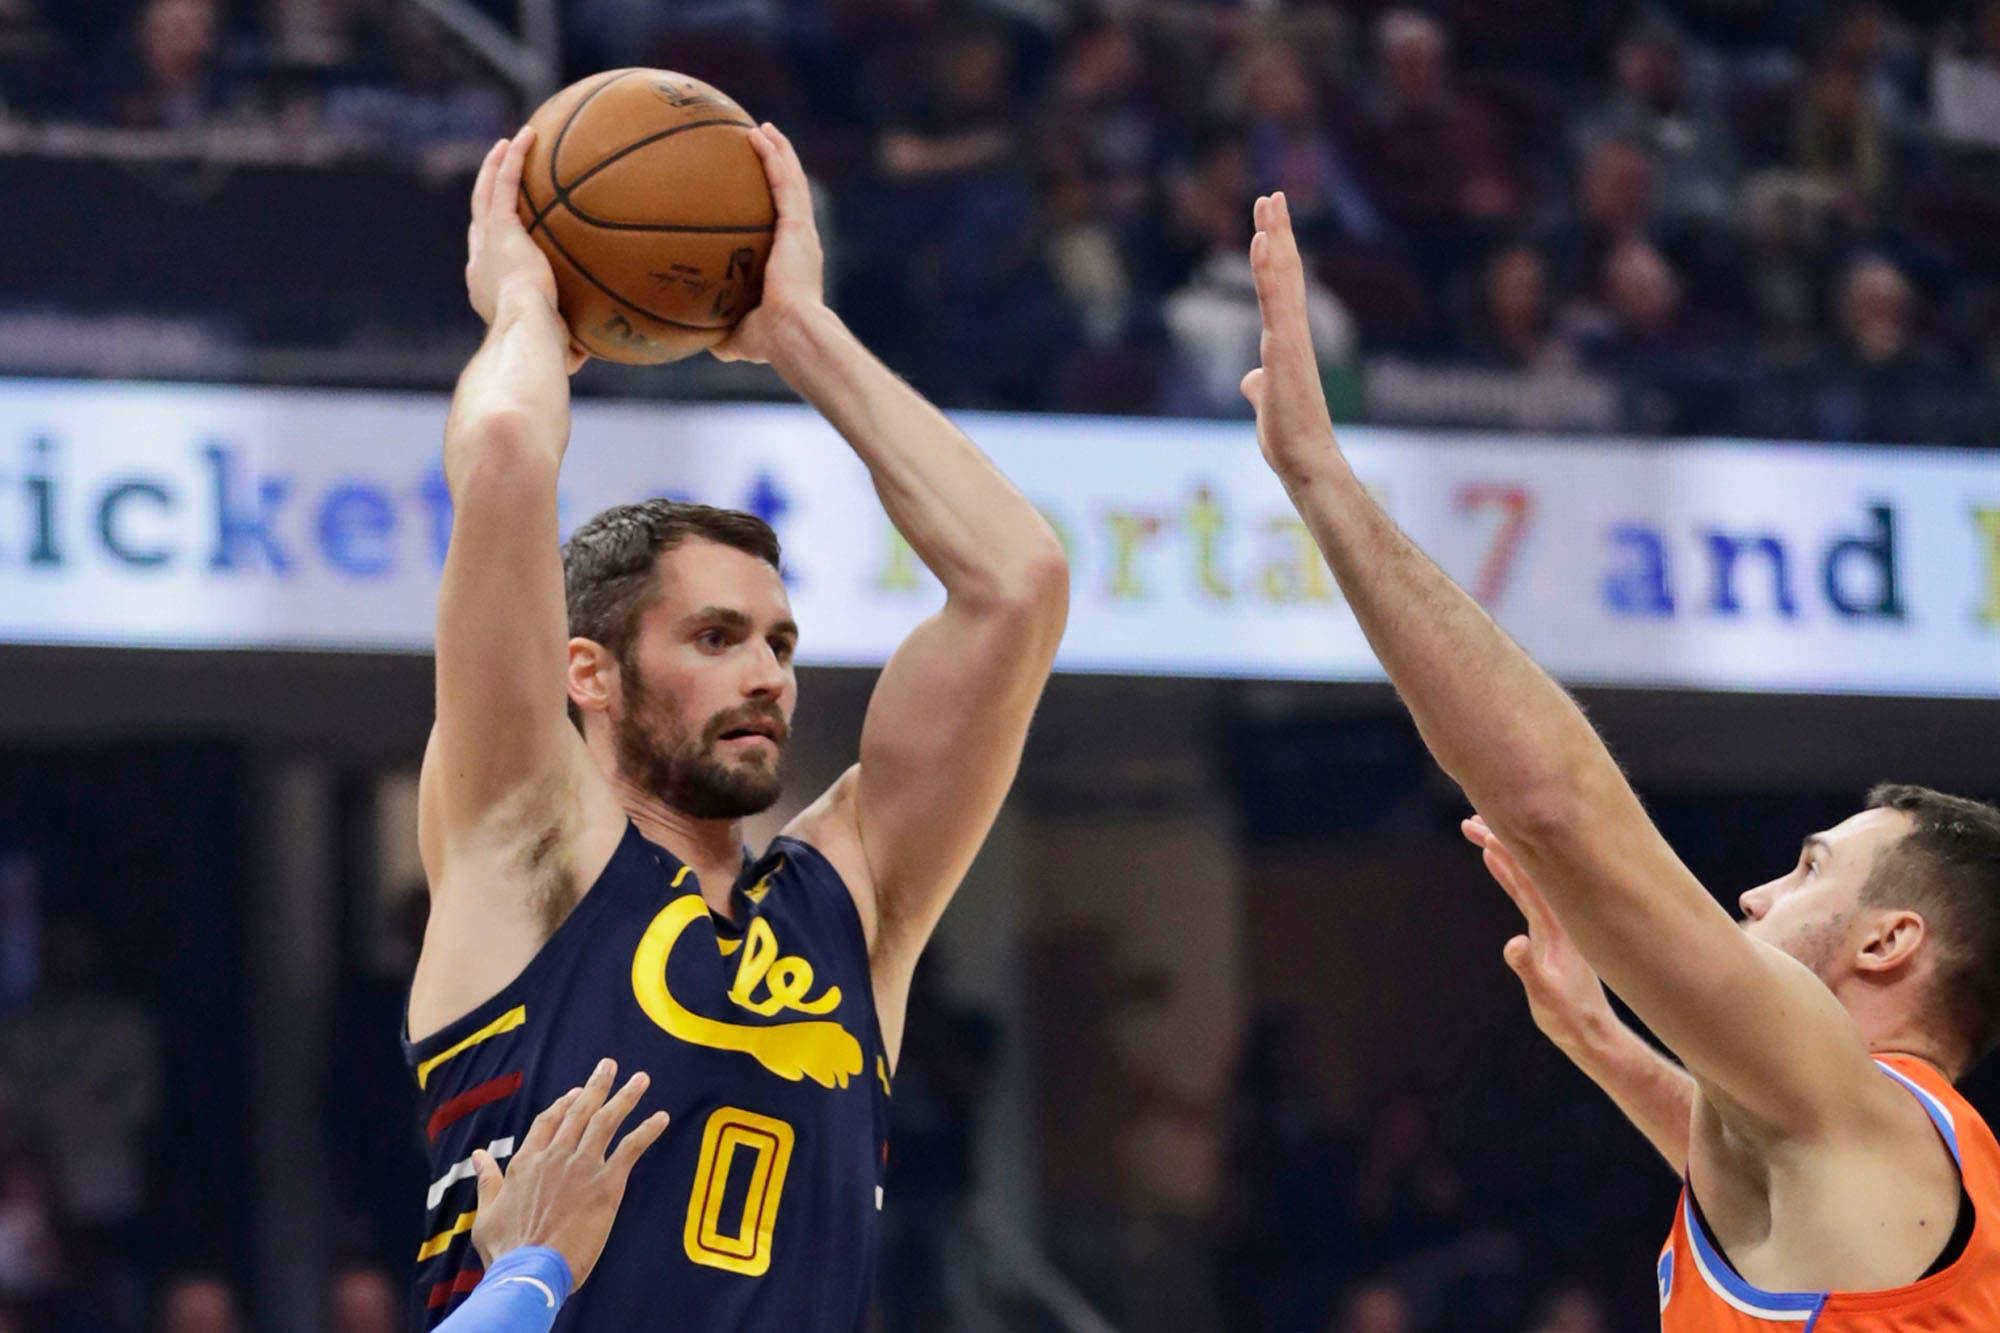 No corre, le pasa mal la pelota a sus compañeros, el acto de indisciplina de una estrella que impacta en la NBA